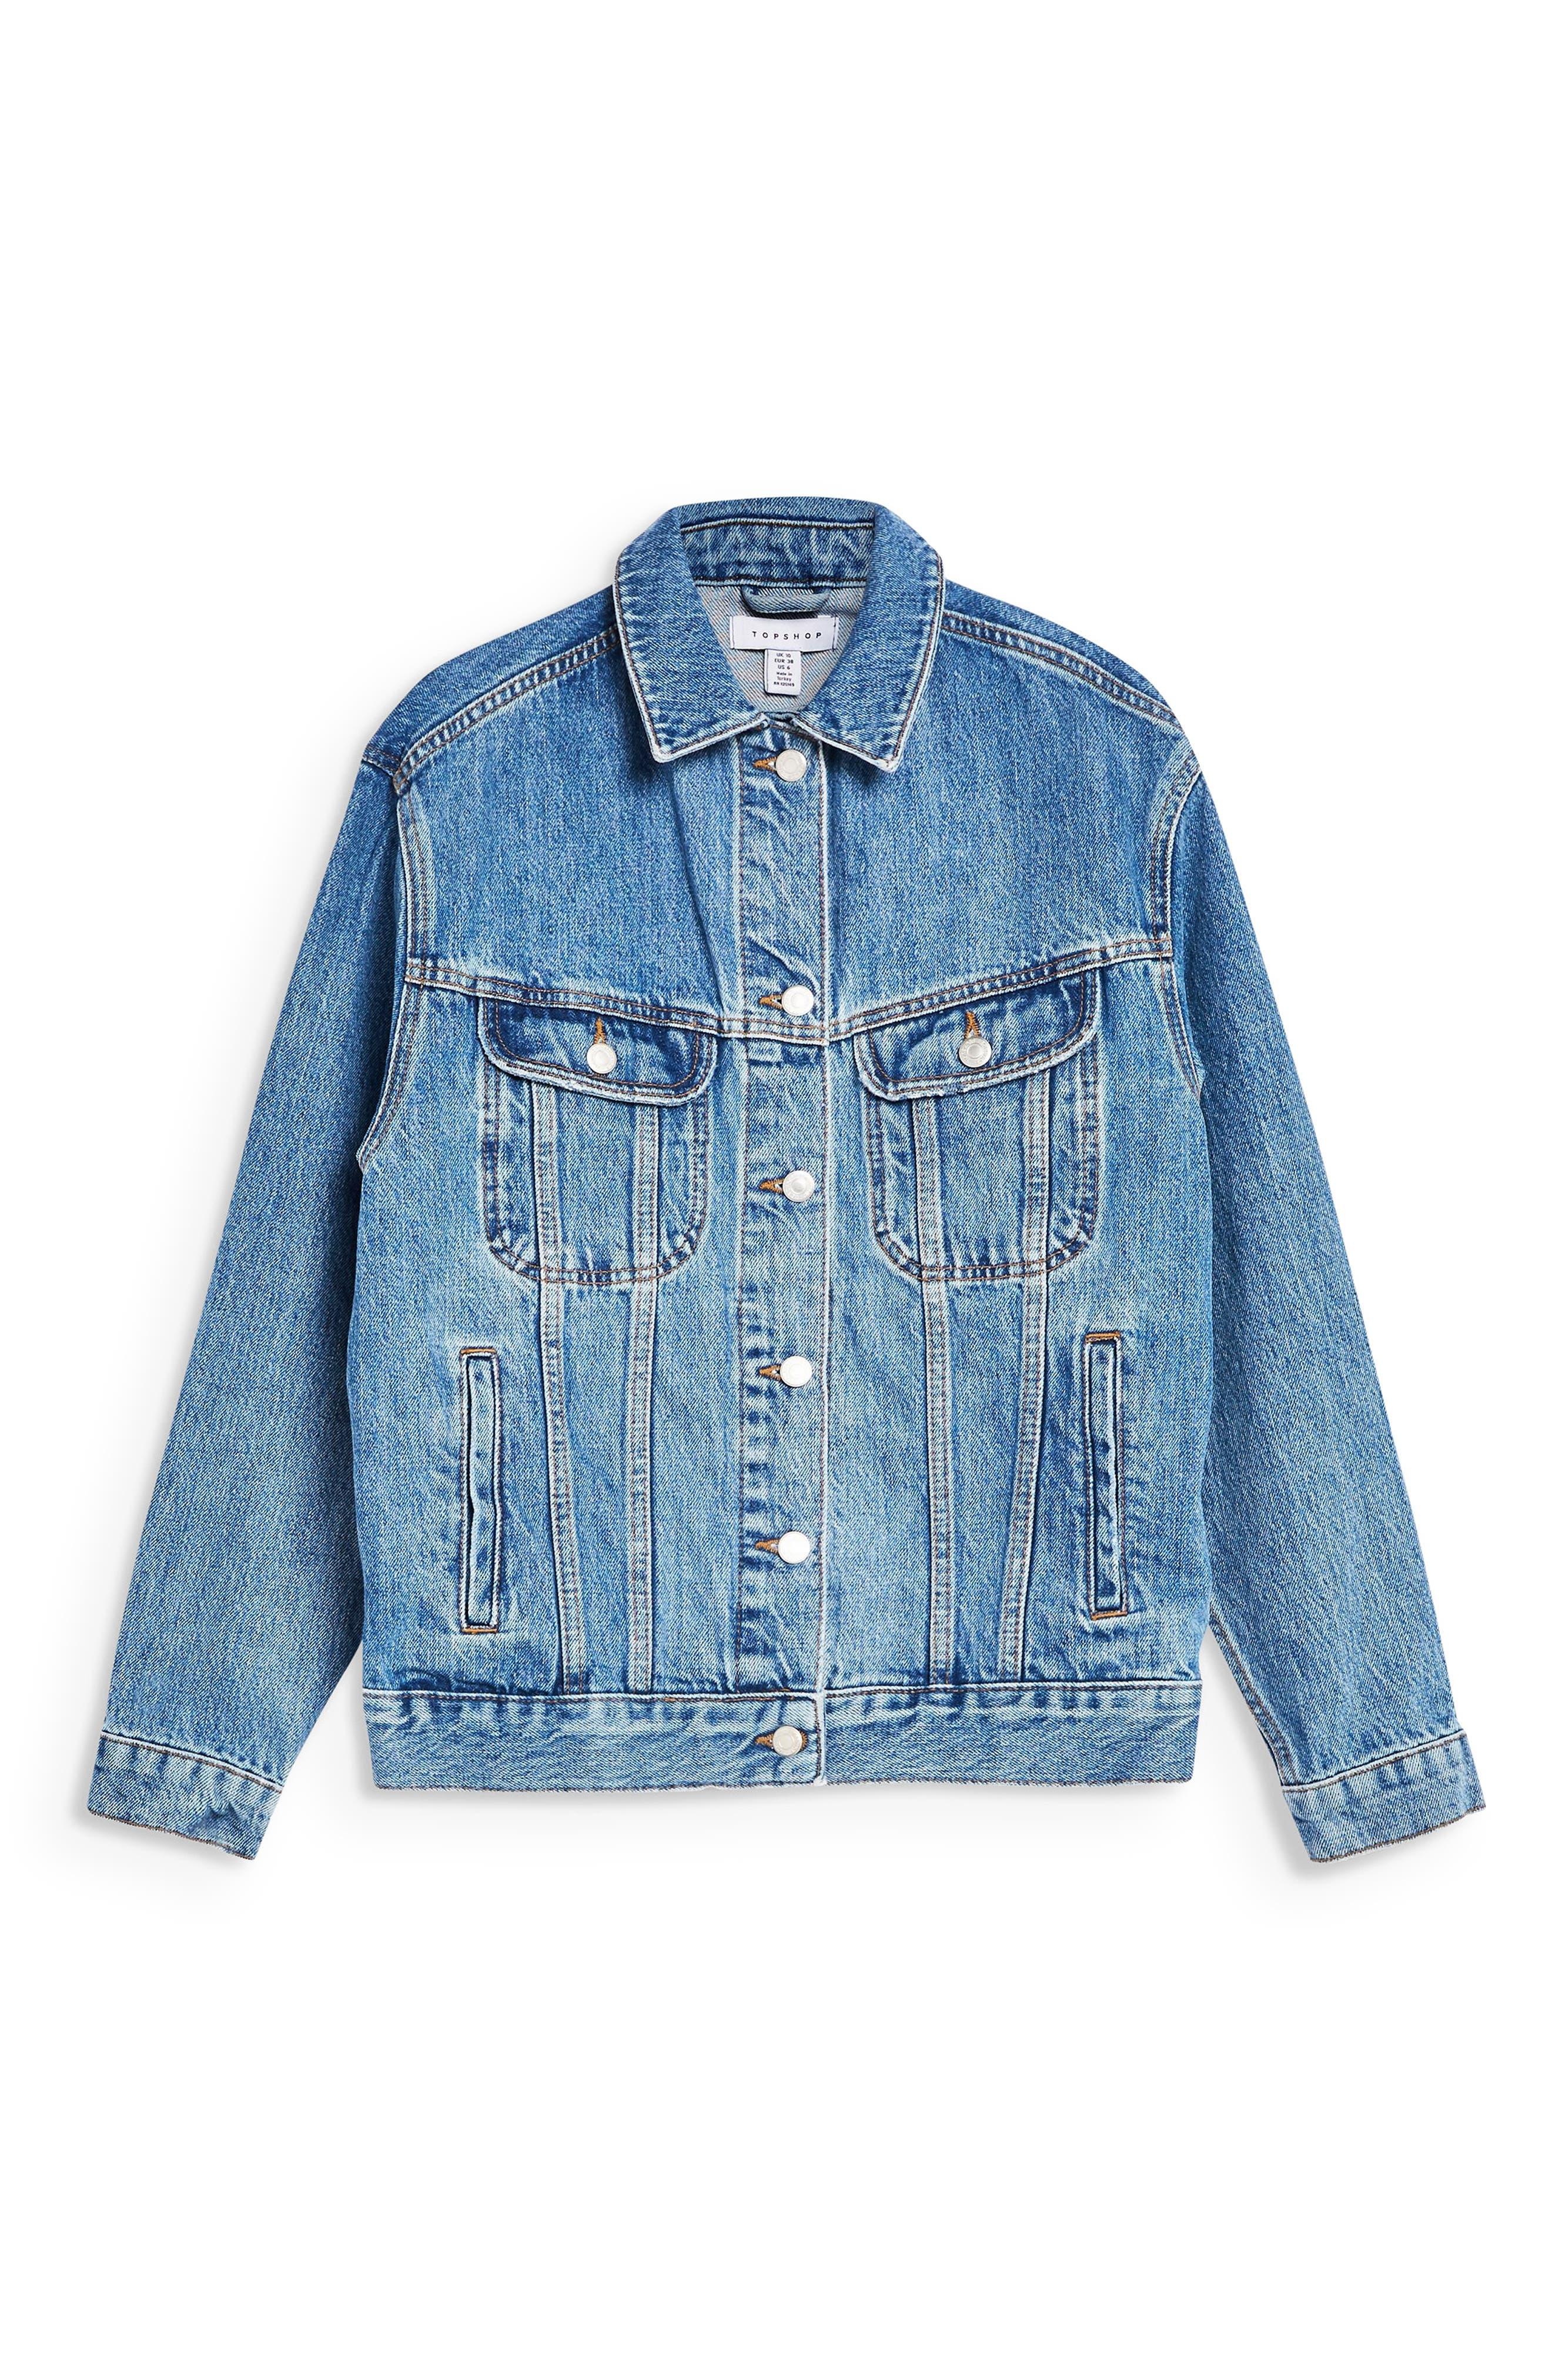 TOPSHOP, Oversized Denim Jacket, Alternate thumbnail 3, color, MID DENIM